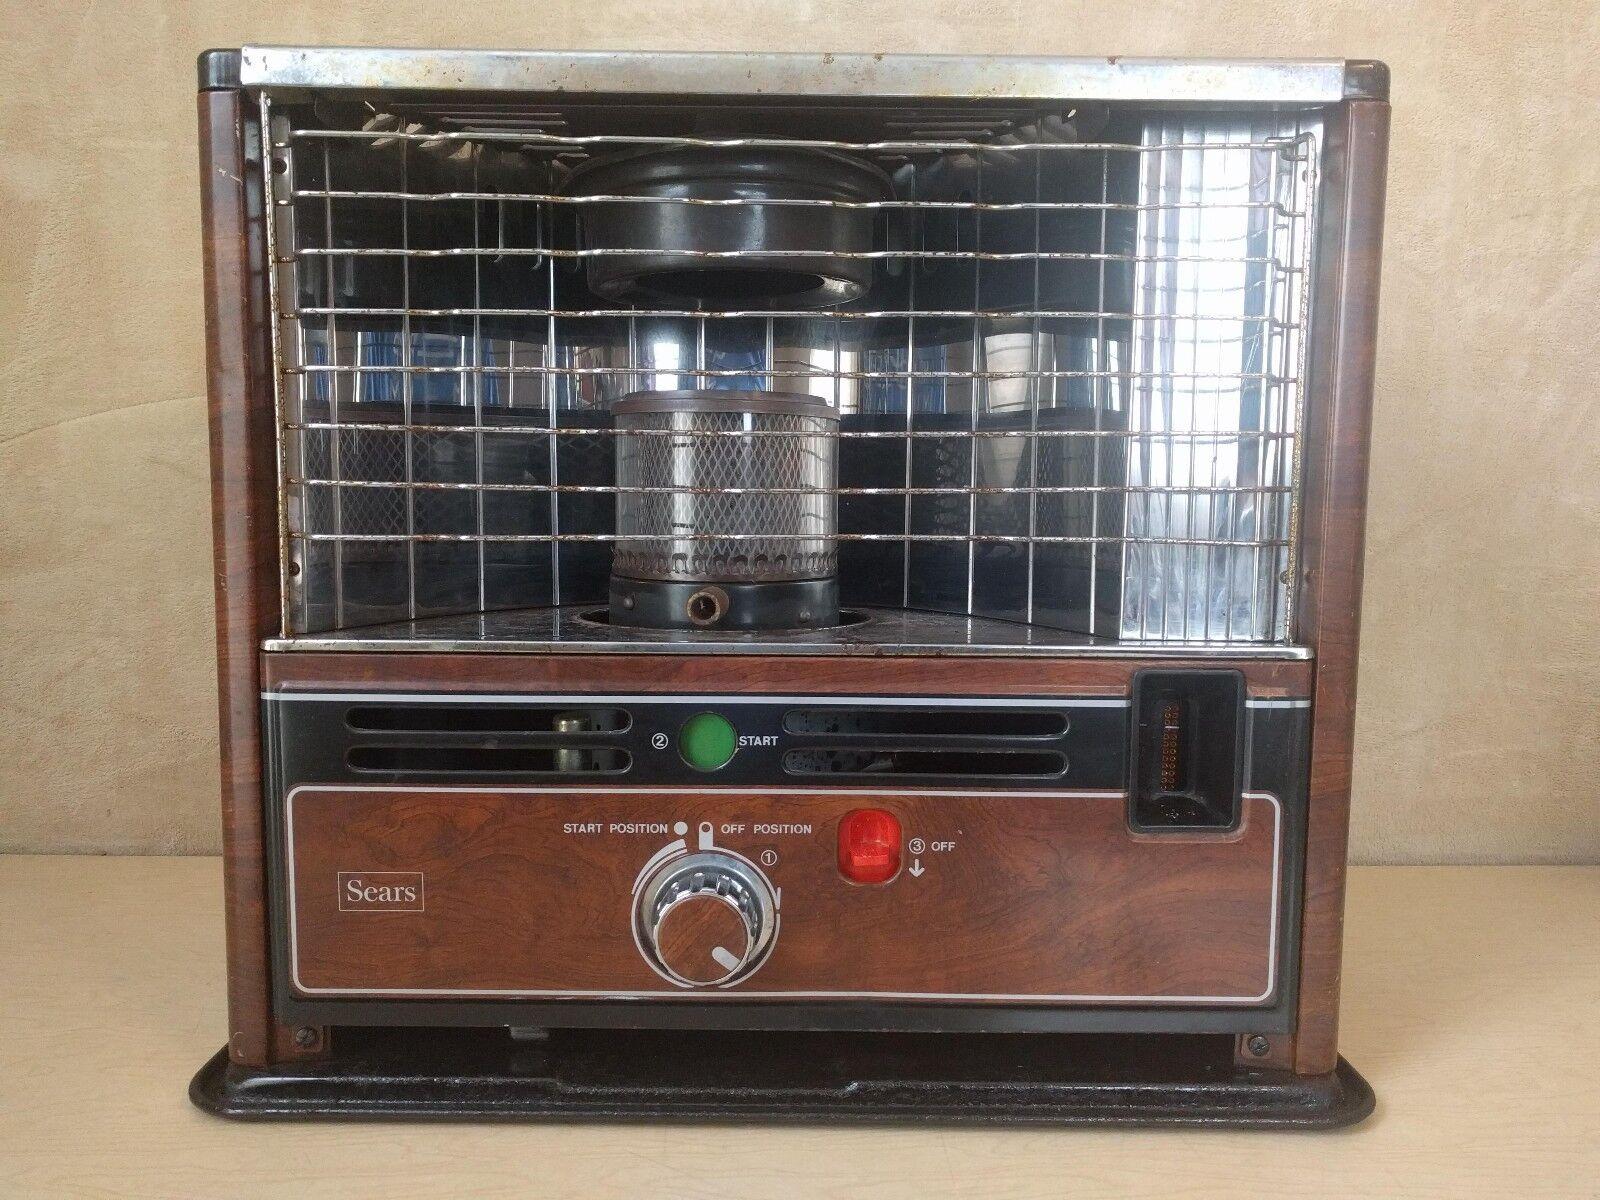 Sears Gas Wall Heaters For Home Furnace Wiring Diagram Kerosene Btu Portable Heater Ebay 1600x1200